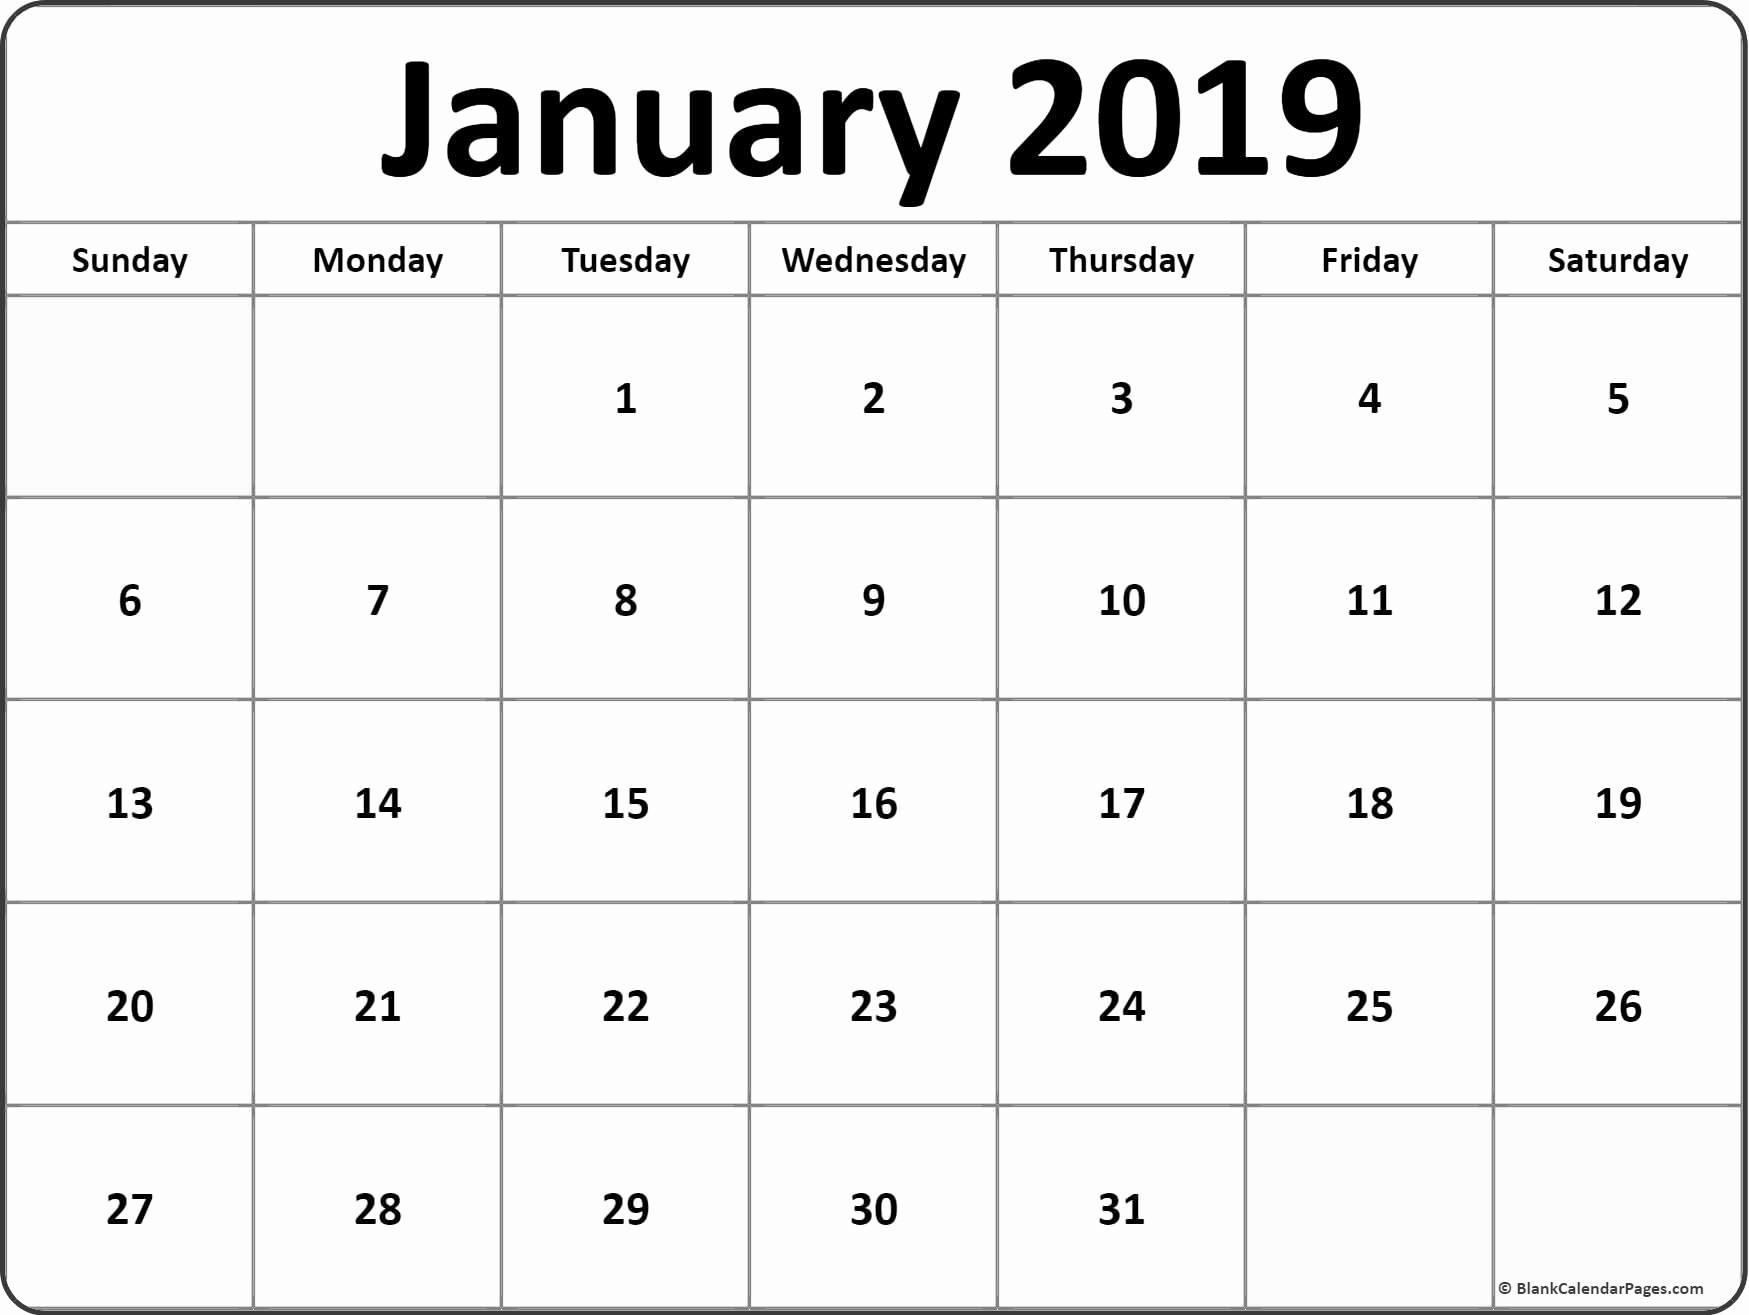 Free Printable Weekly Calendar 2019 New January 2019 Blank Calendar Templates